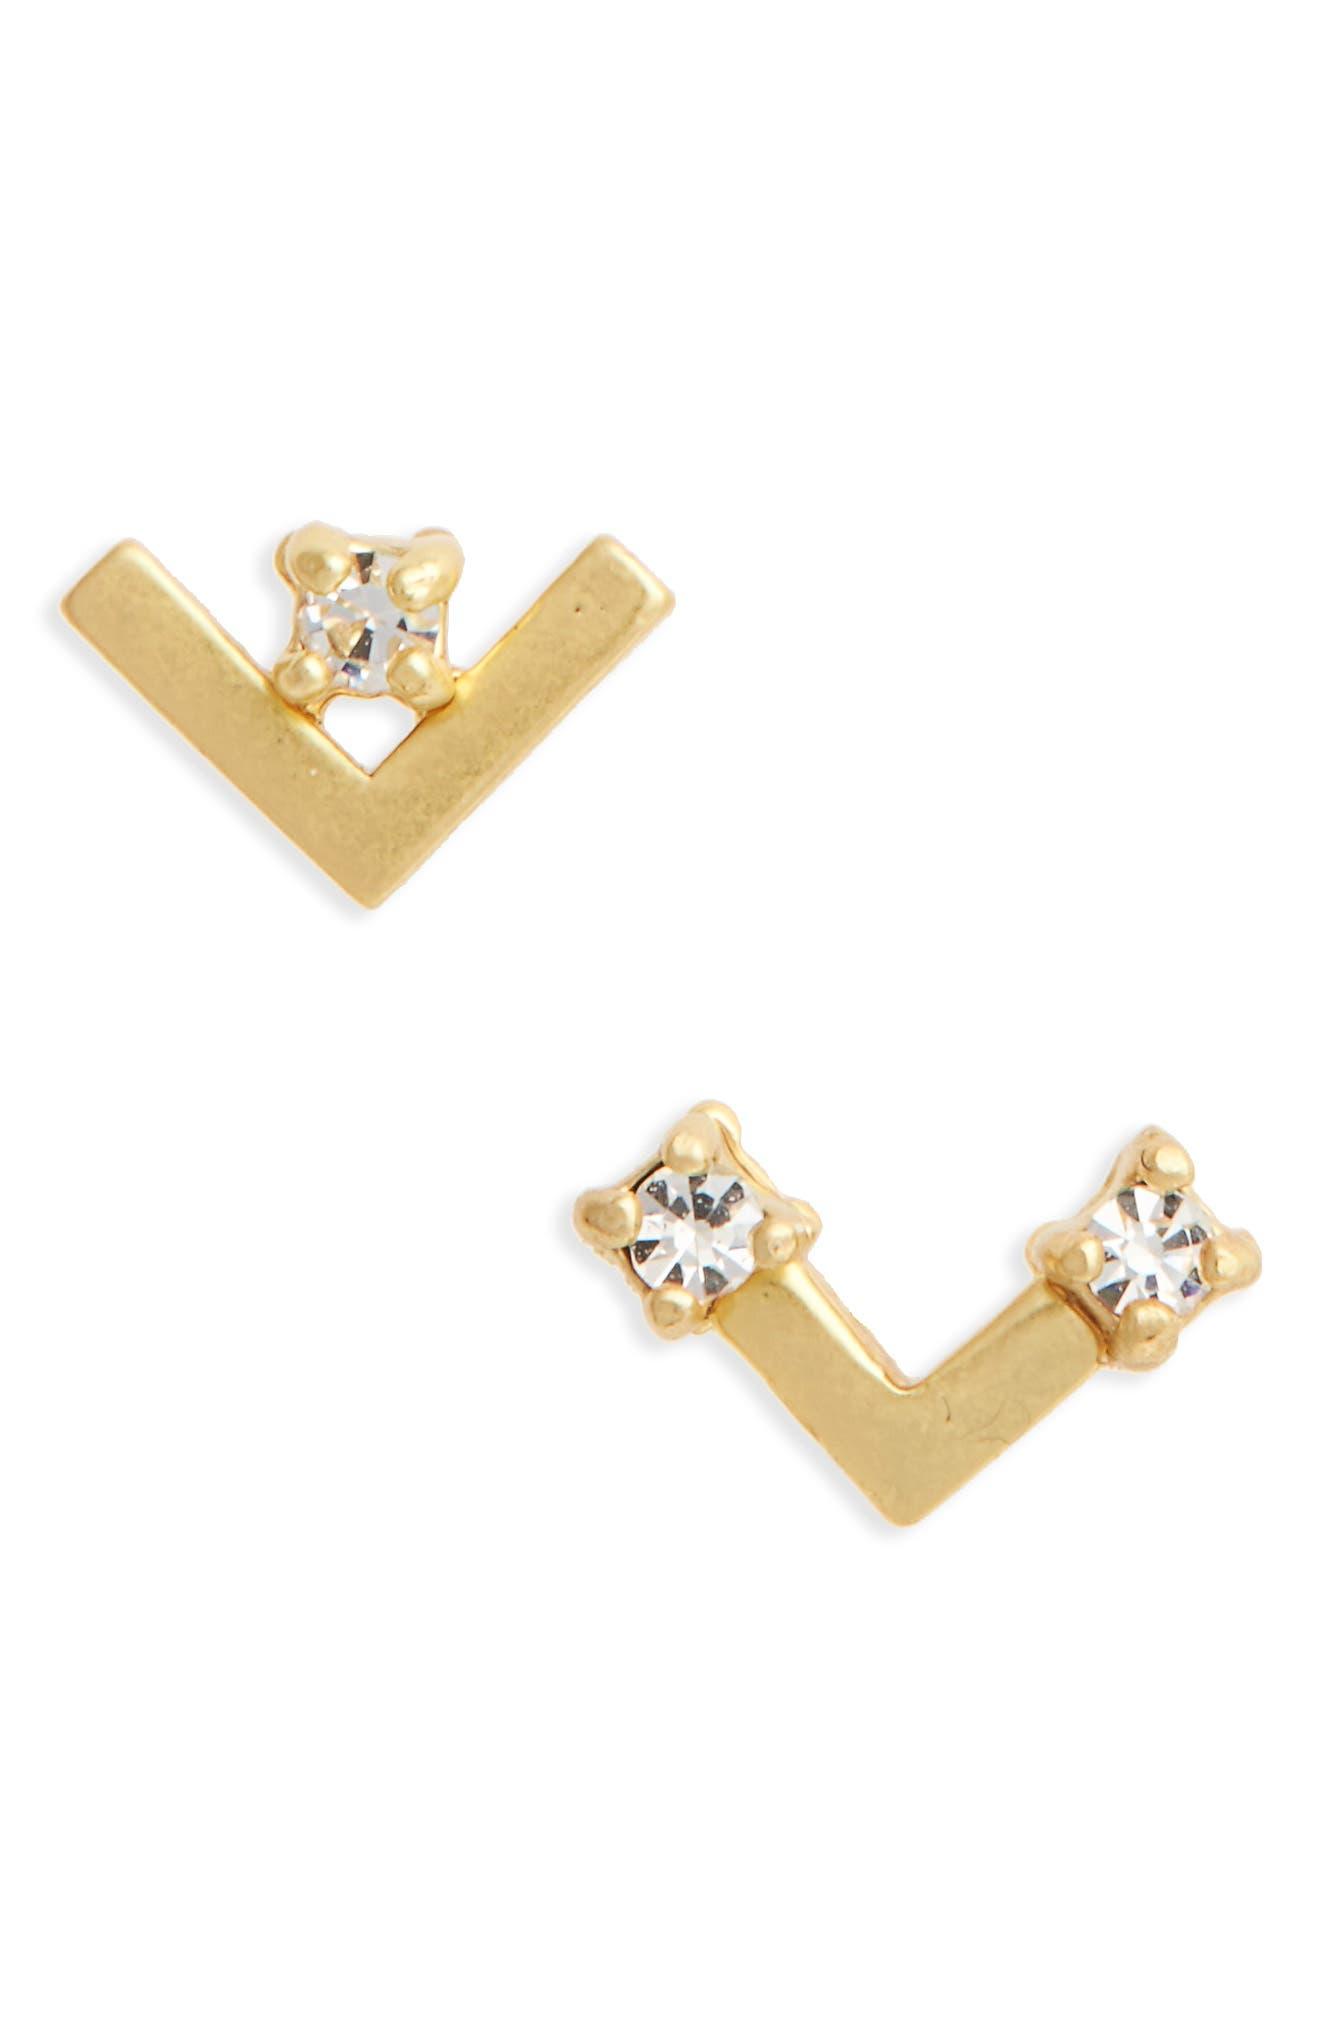 Madewell Asymmetrical Stud Earrings